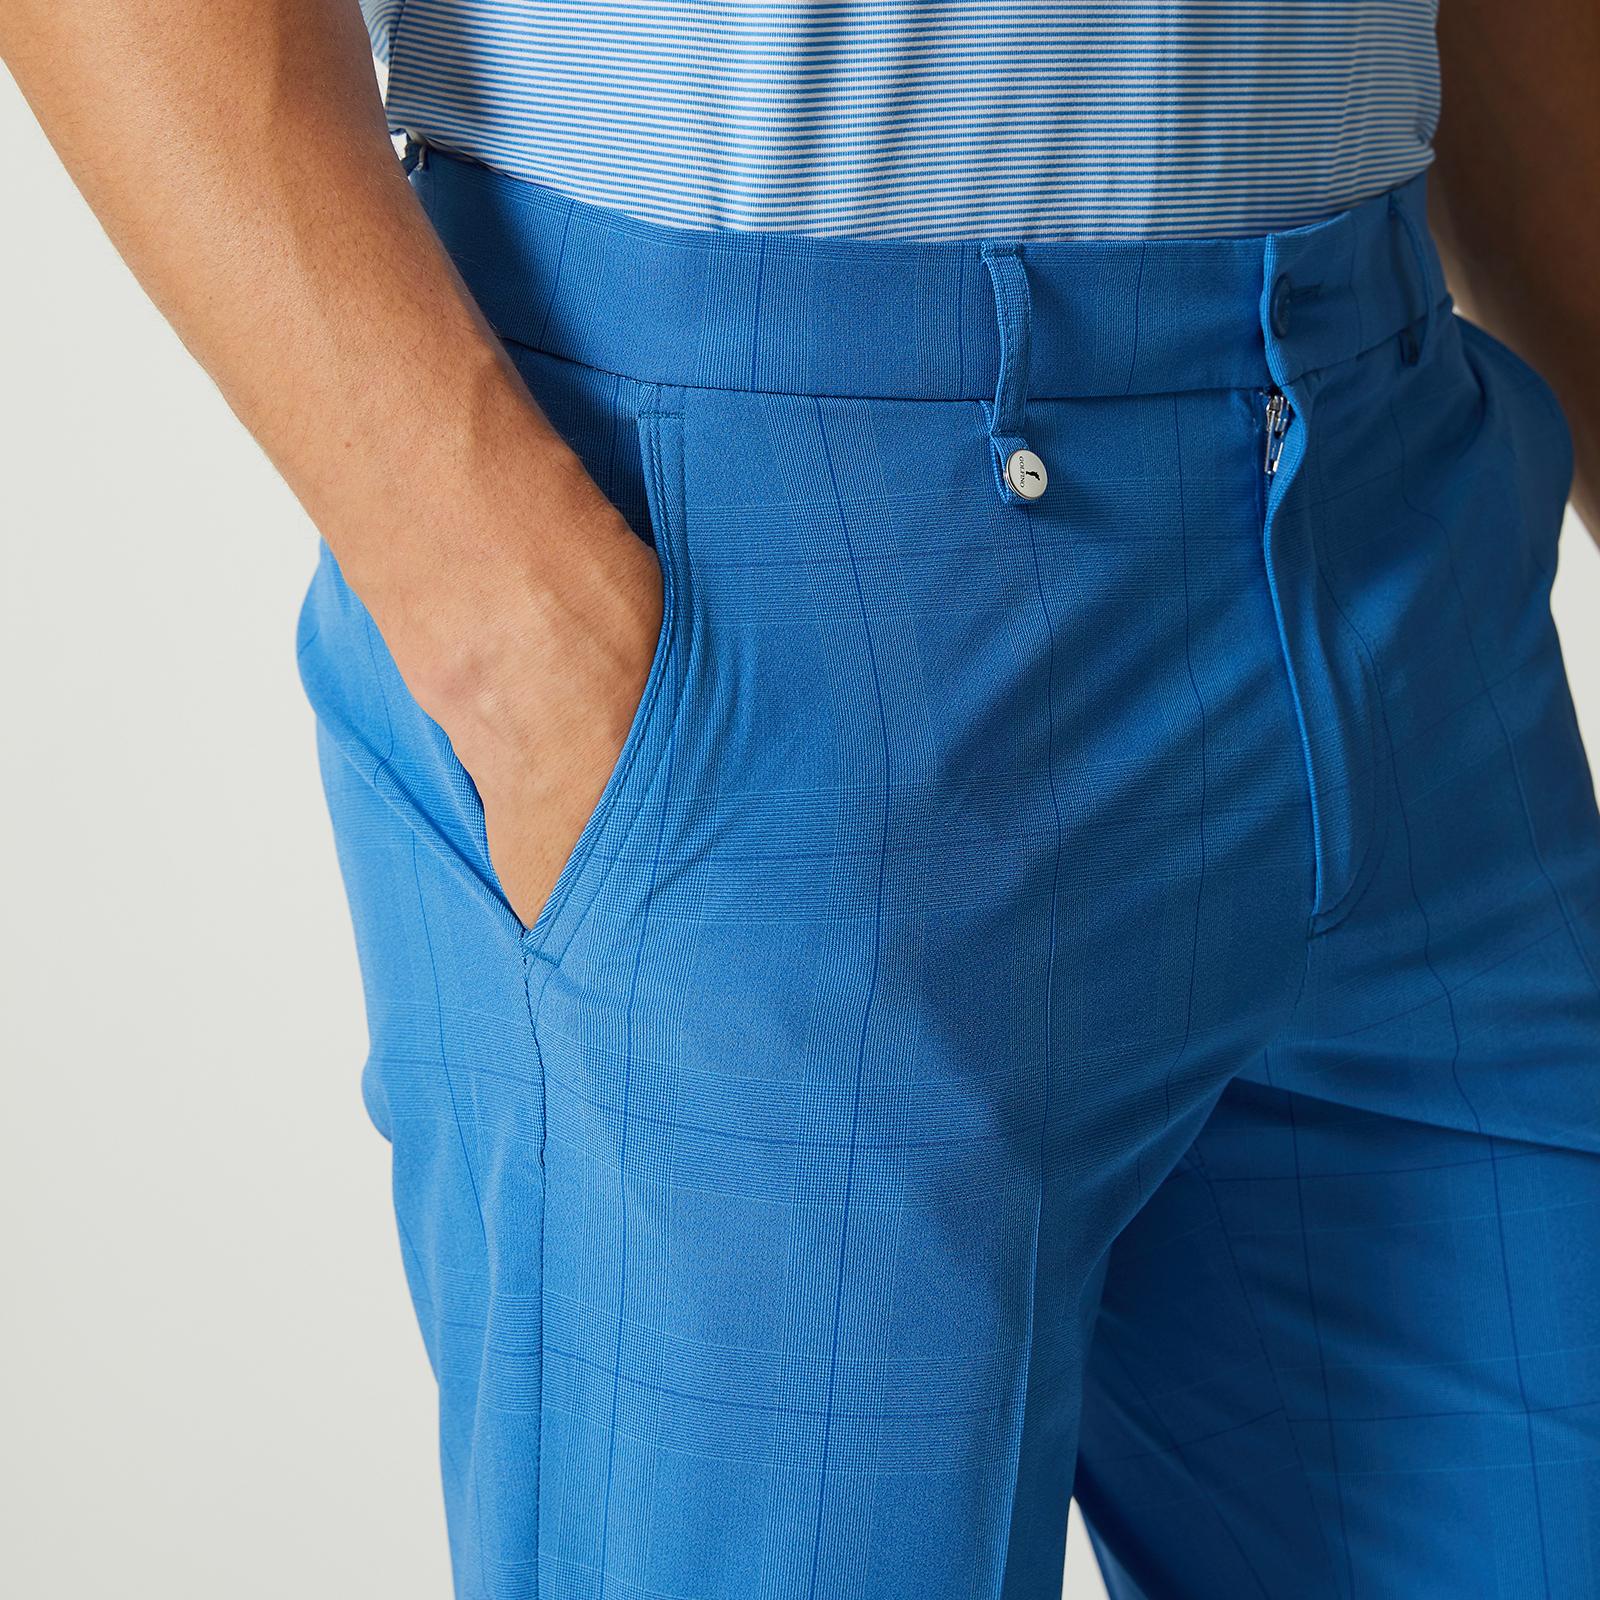 Karo Stretch Hose (Regular Fit)